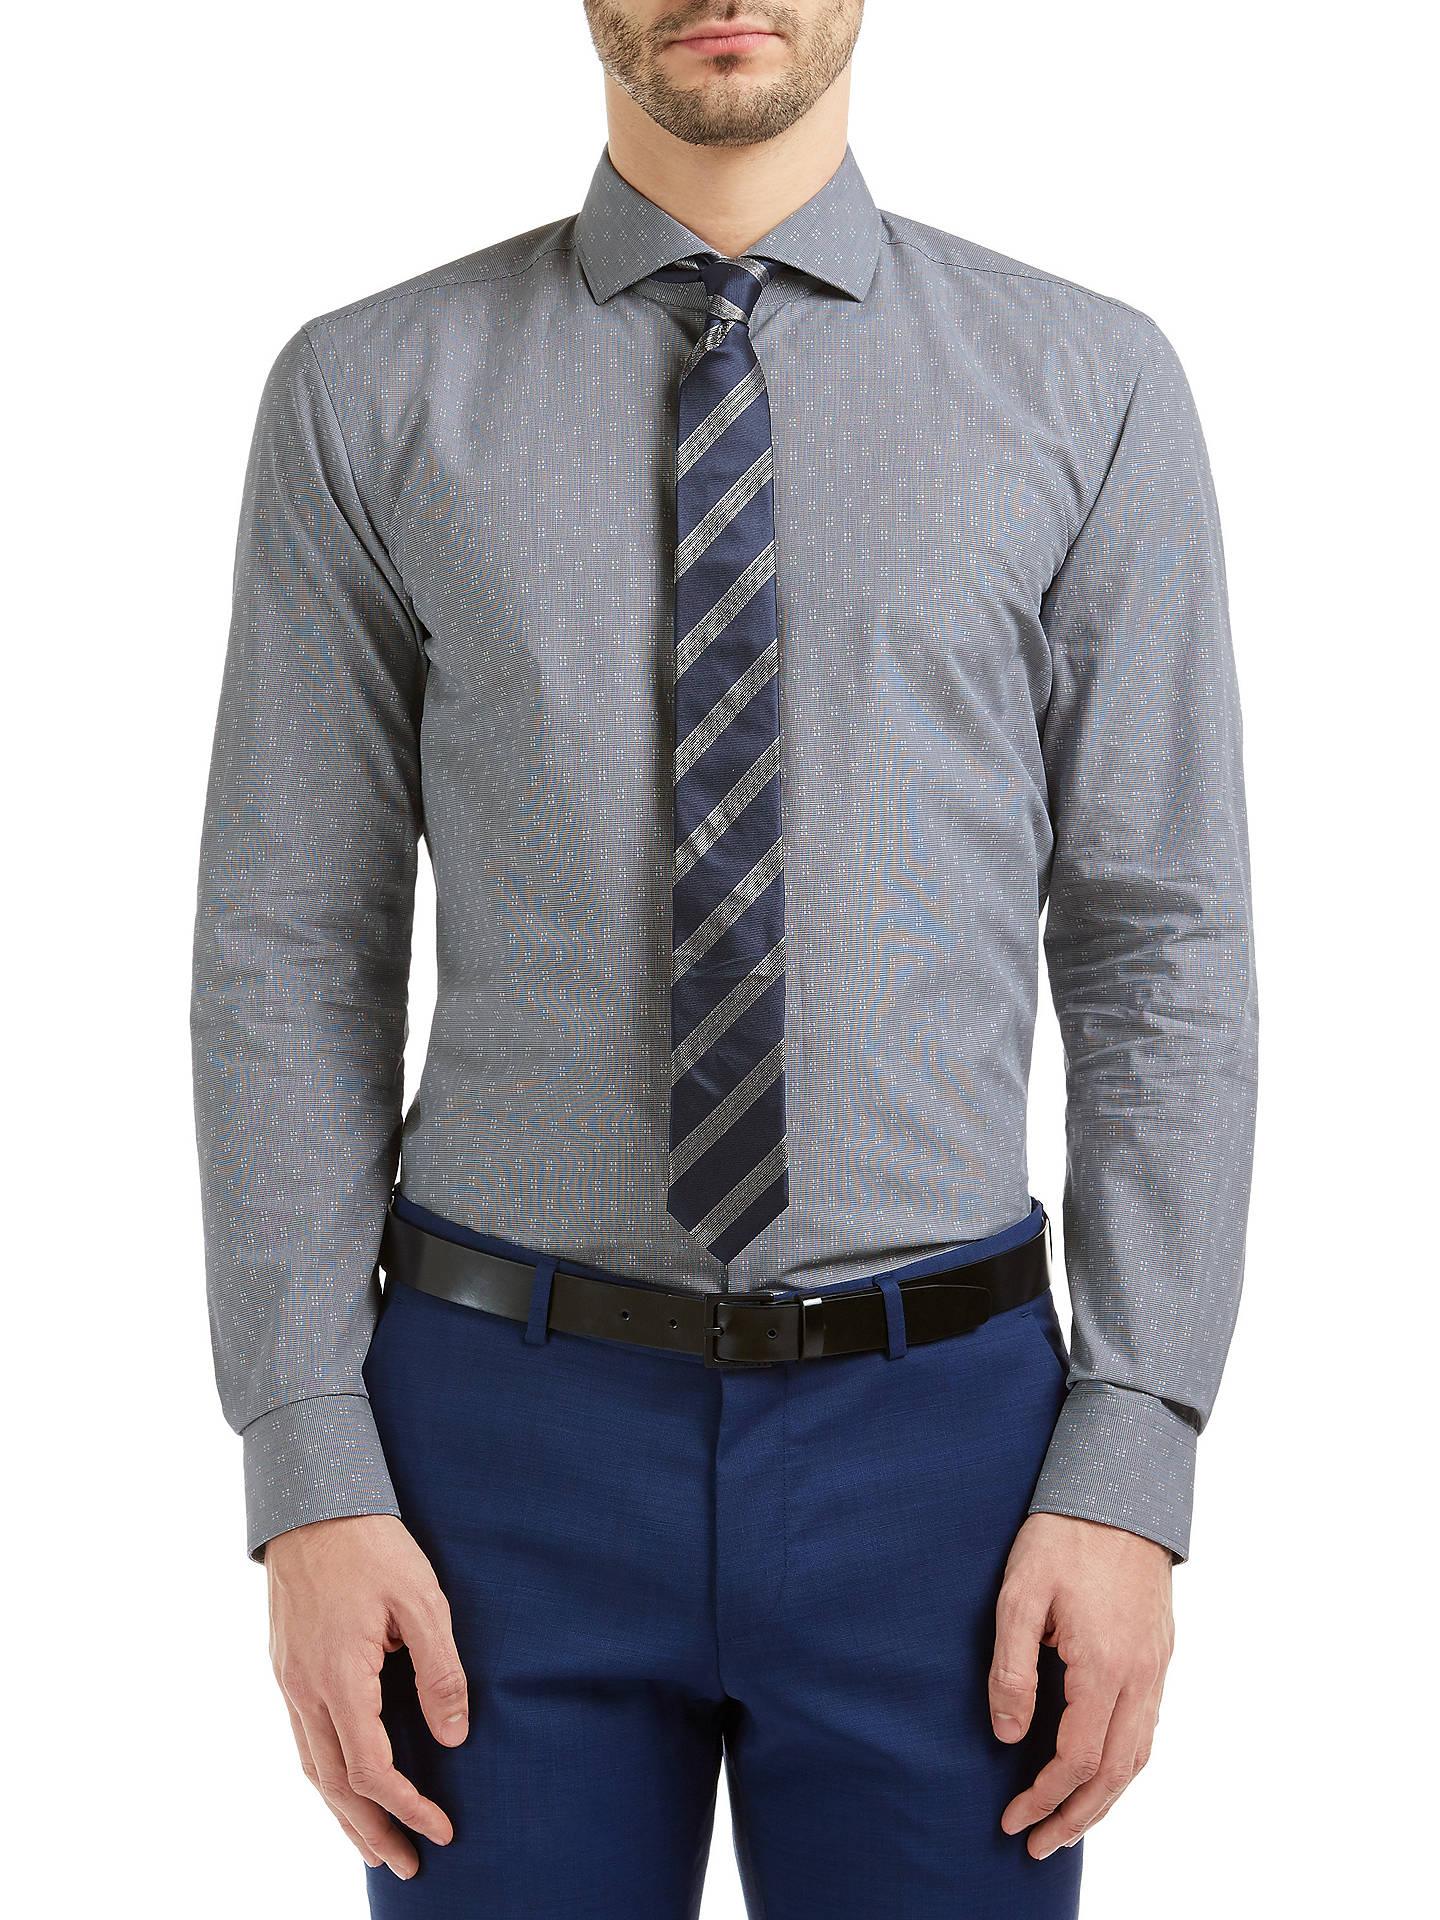 3048f9133 HUGO by Hugo Boss C-Jason Slim Fit Cotton Shirt at John Lewis & Partners